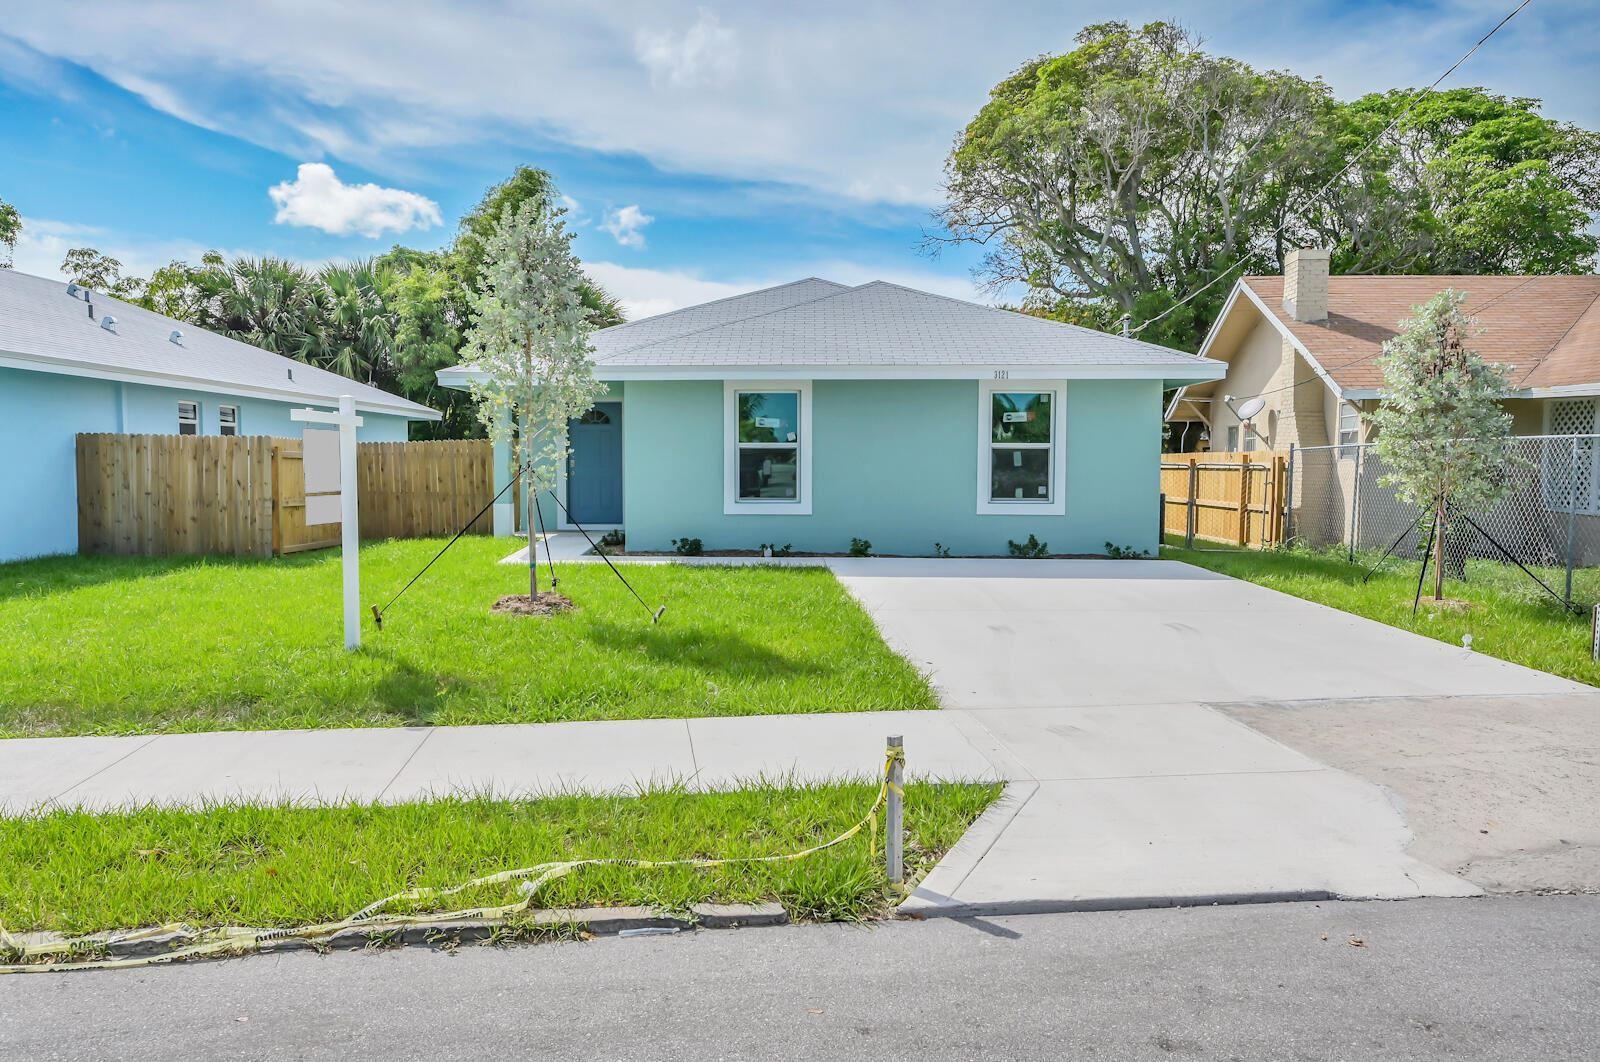 3121 Pinewood Avenue, West Palm Beach, FL 33407 - MLS#: RX-10750615